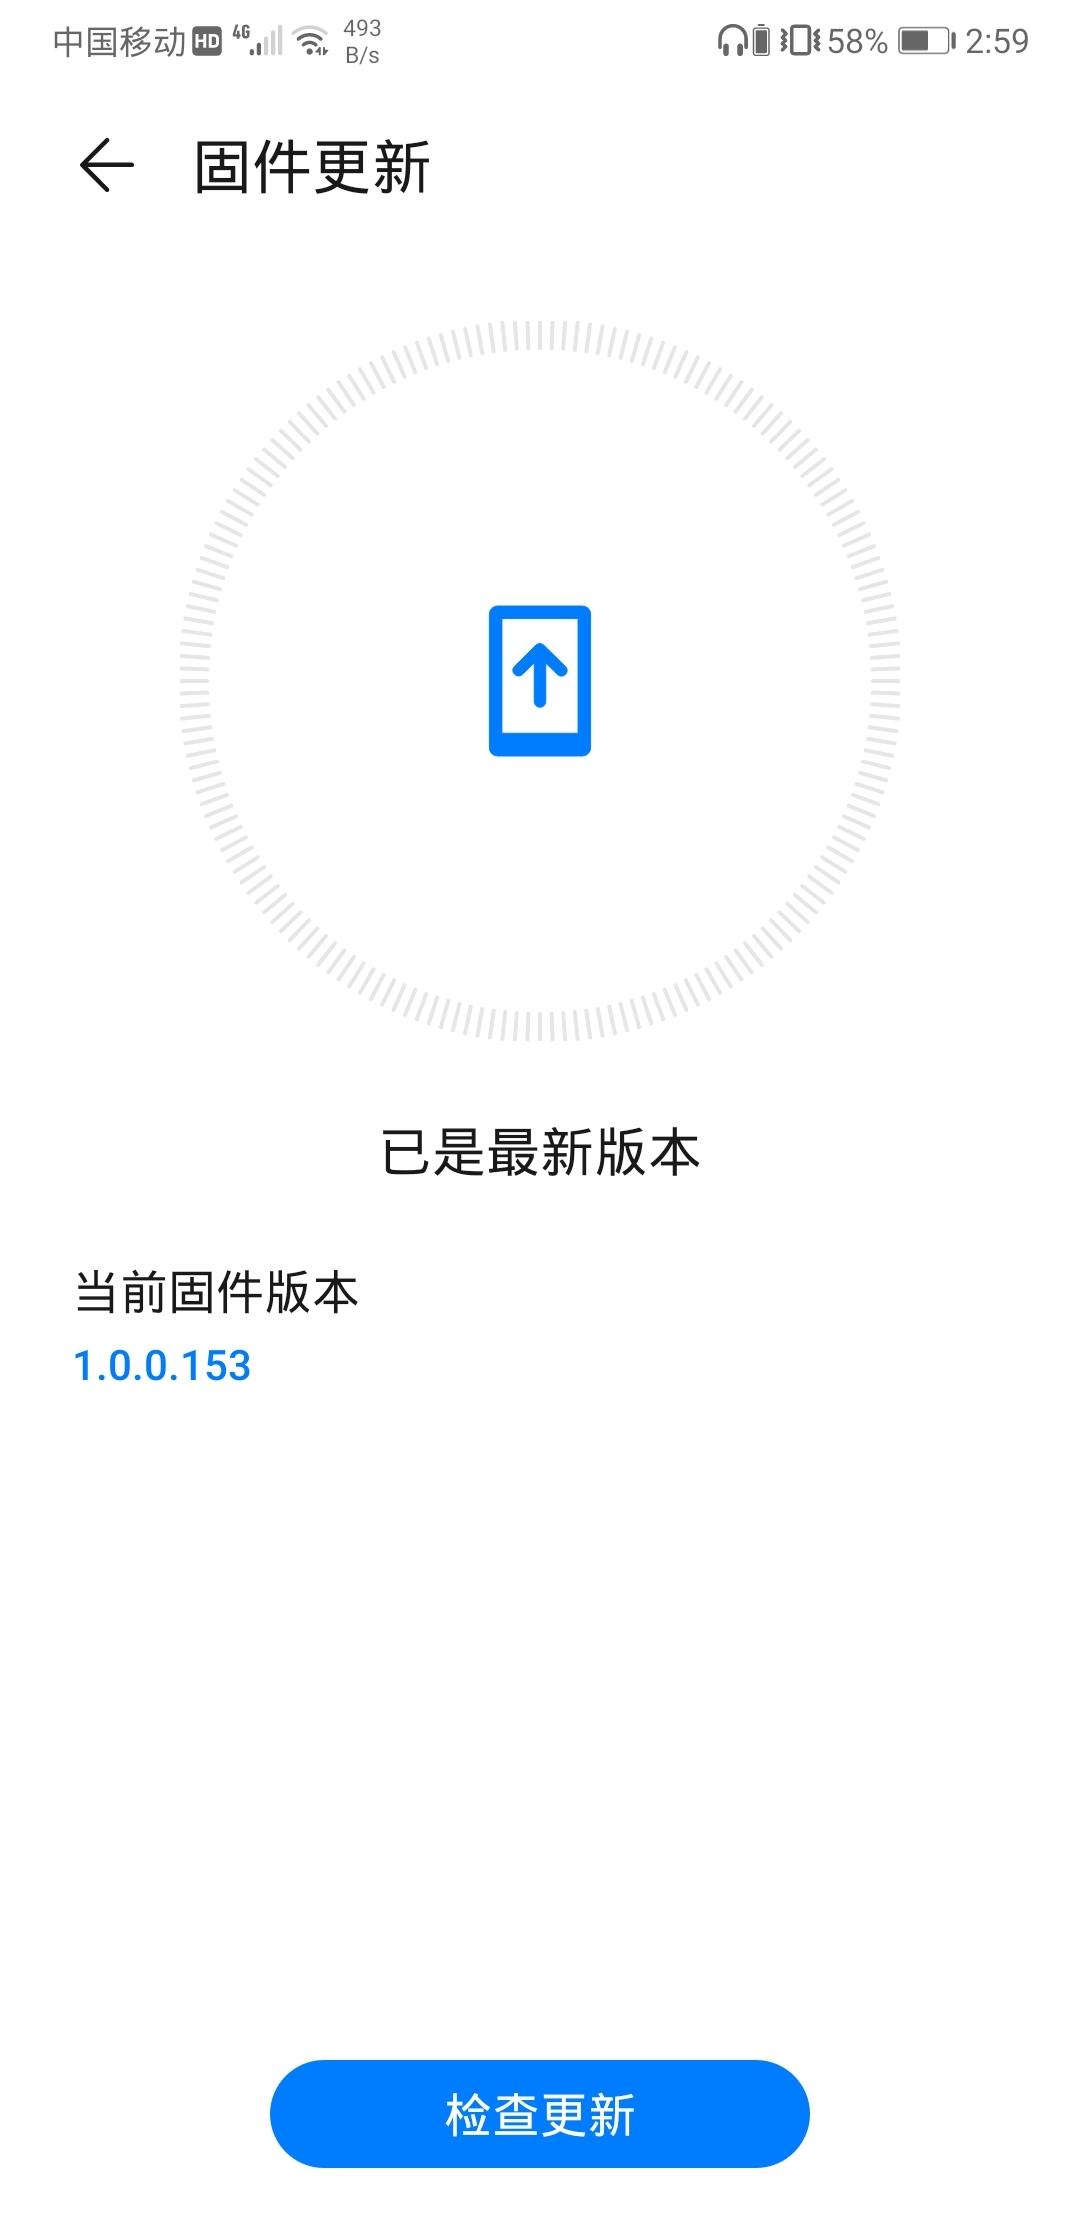 Screenshot_20200709_145950_com.huawei.iconnect.jpg